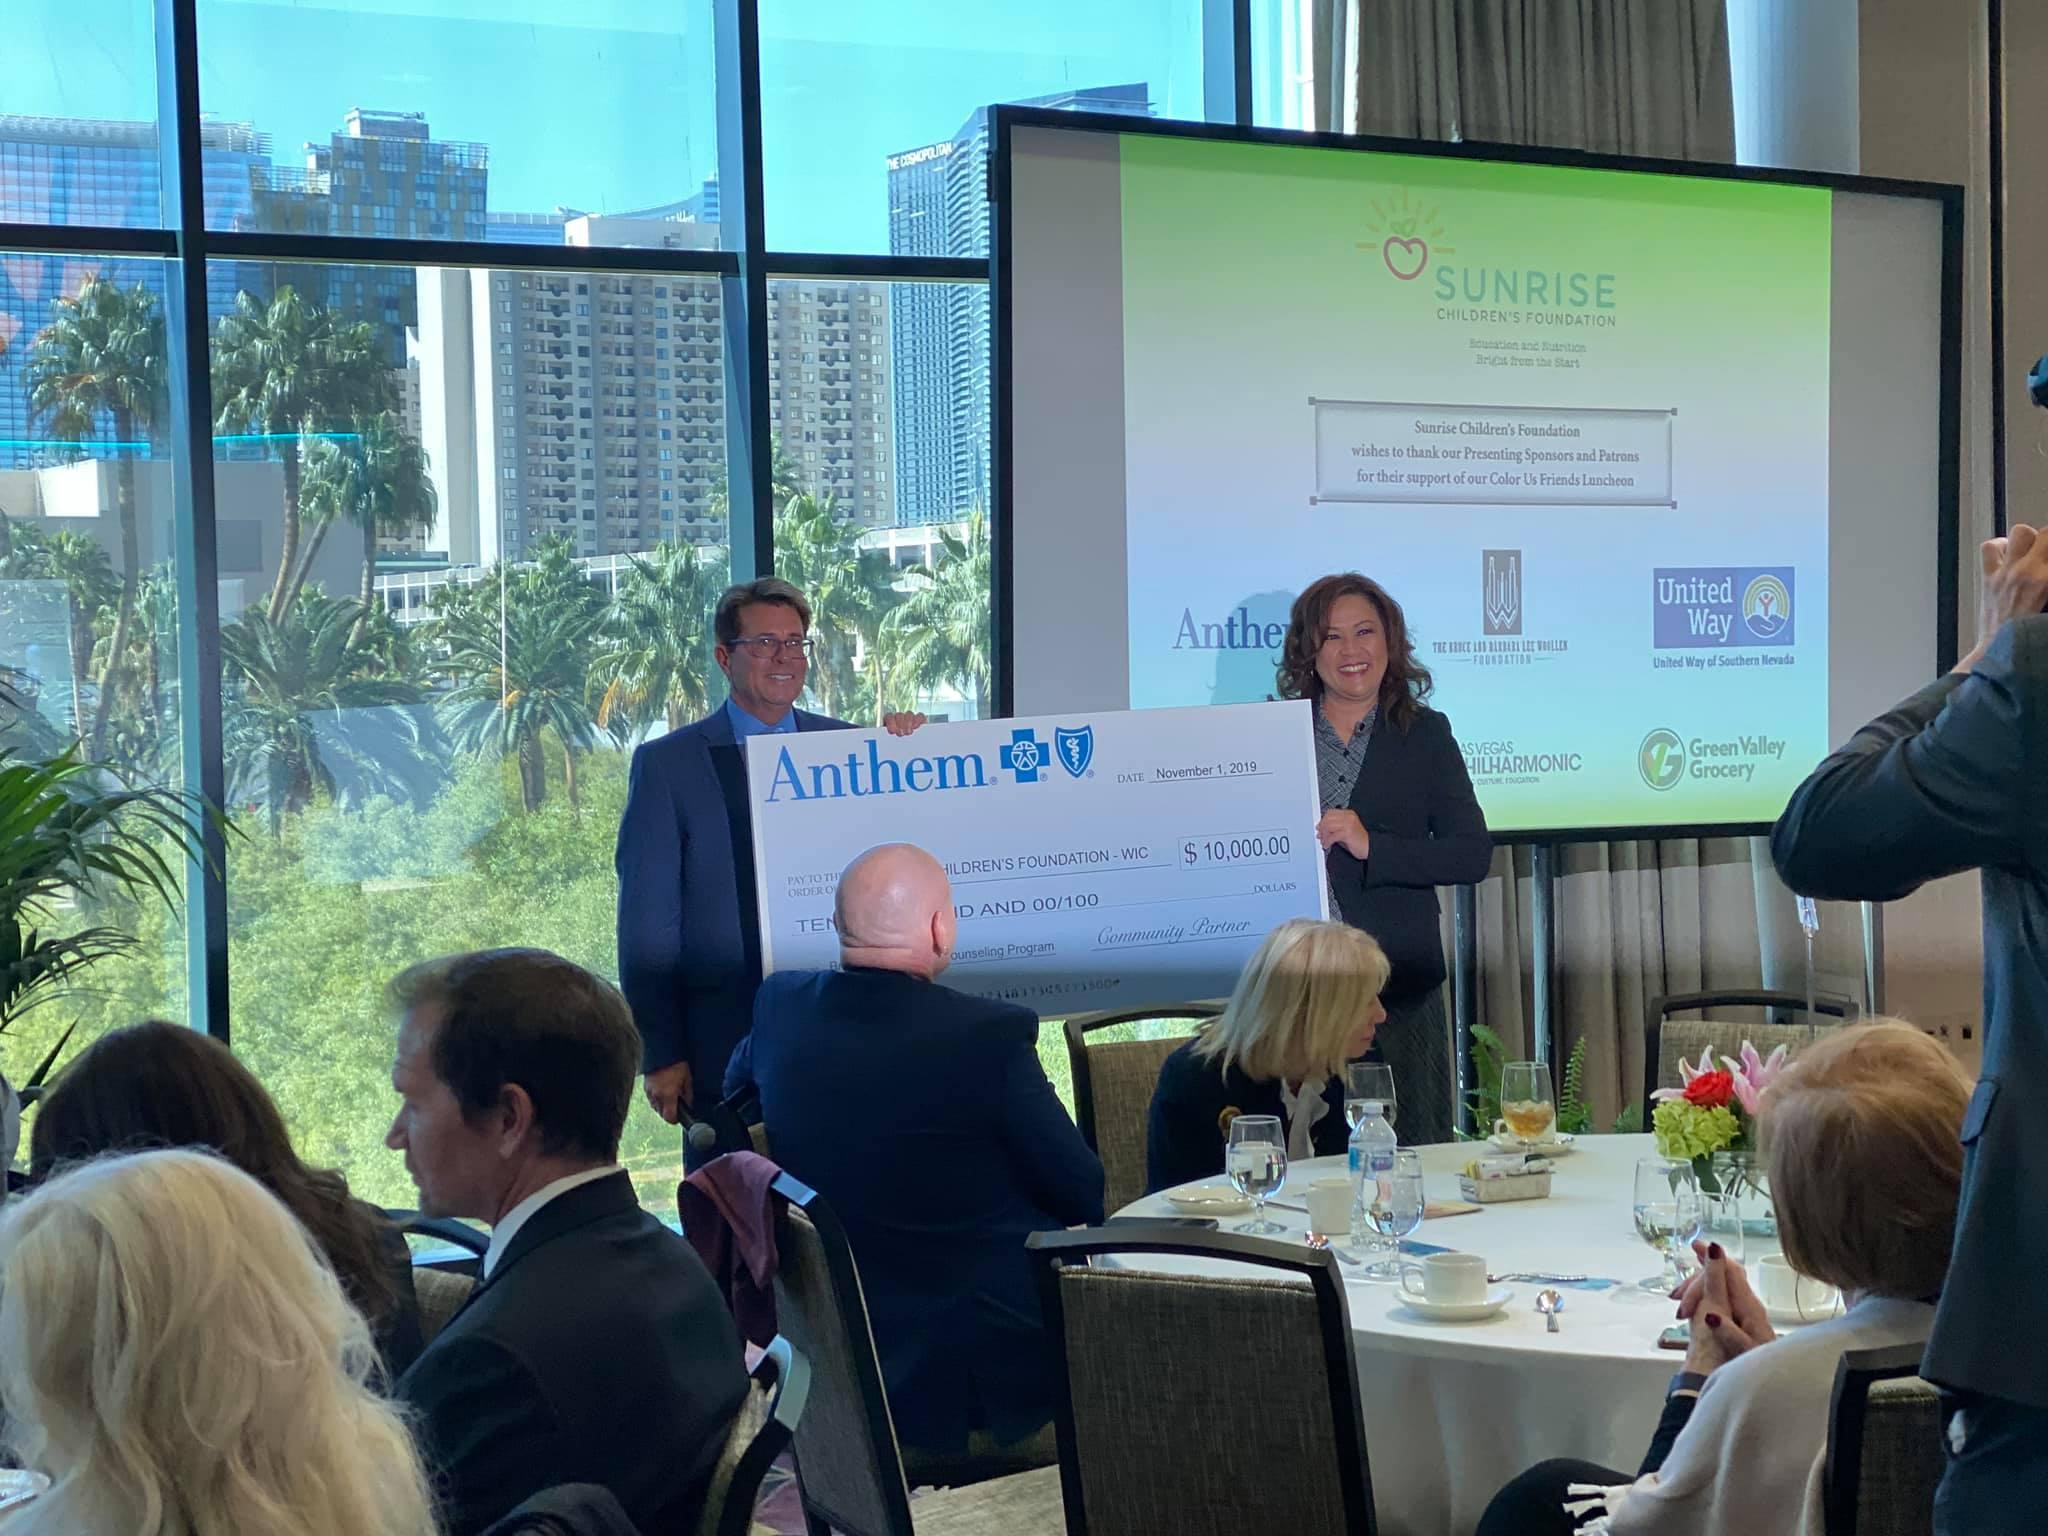 Sunrise Children's Foundation Thanks Community - Receives ...